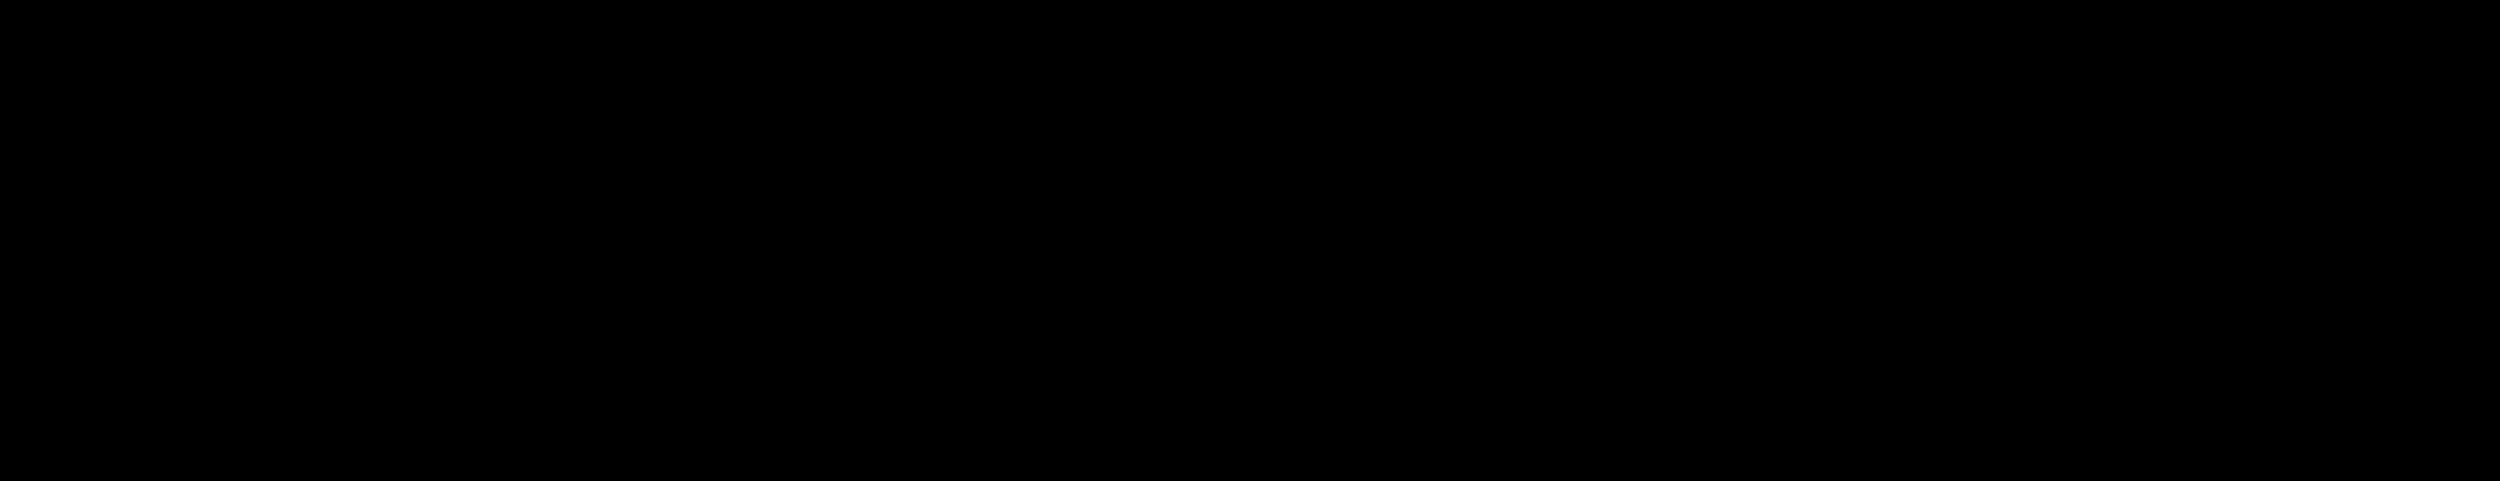 fayreground_logo_high_res.png